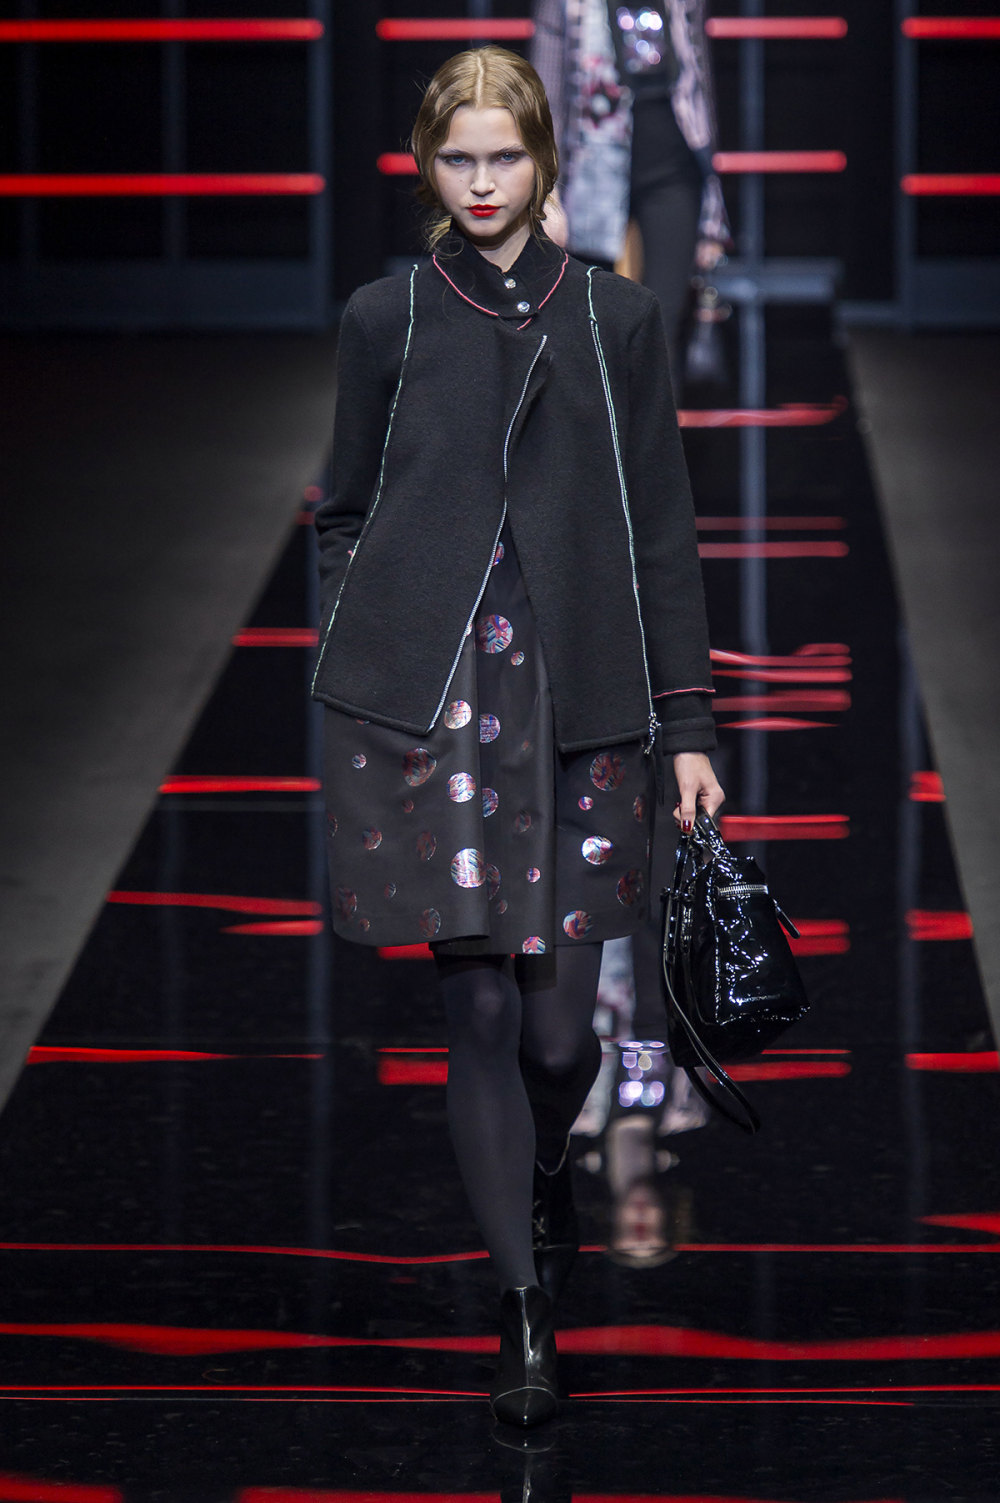 Emporio Armani时装系列畅的裤子带有柔滑裙子的鸡尾酒礼服-38.jpg